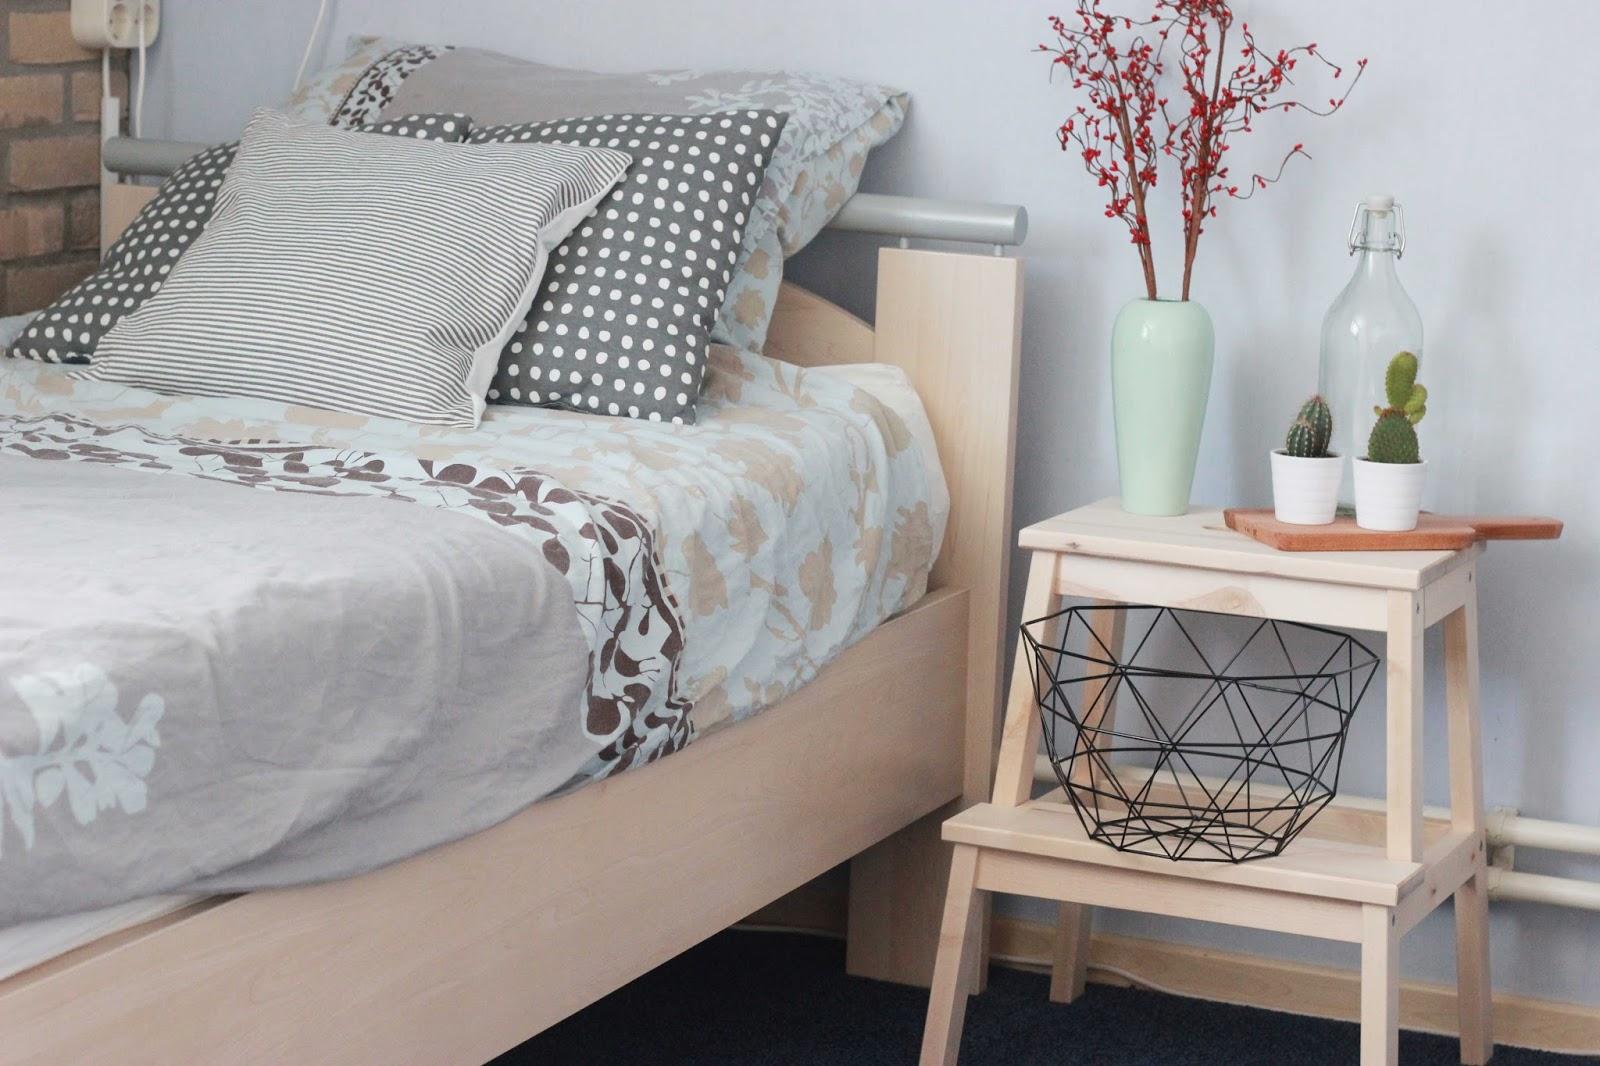 Ikea Slaapkamer Assortiment : Ikea slaapkamer assortiment. het ontwerp with ikea slaapkamer